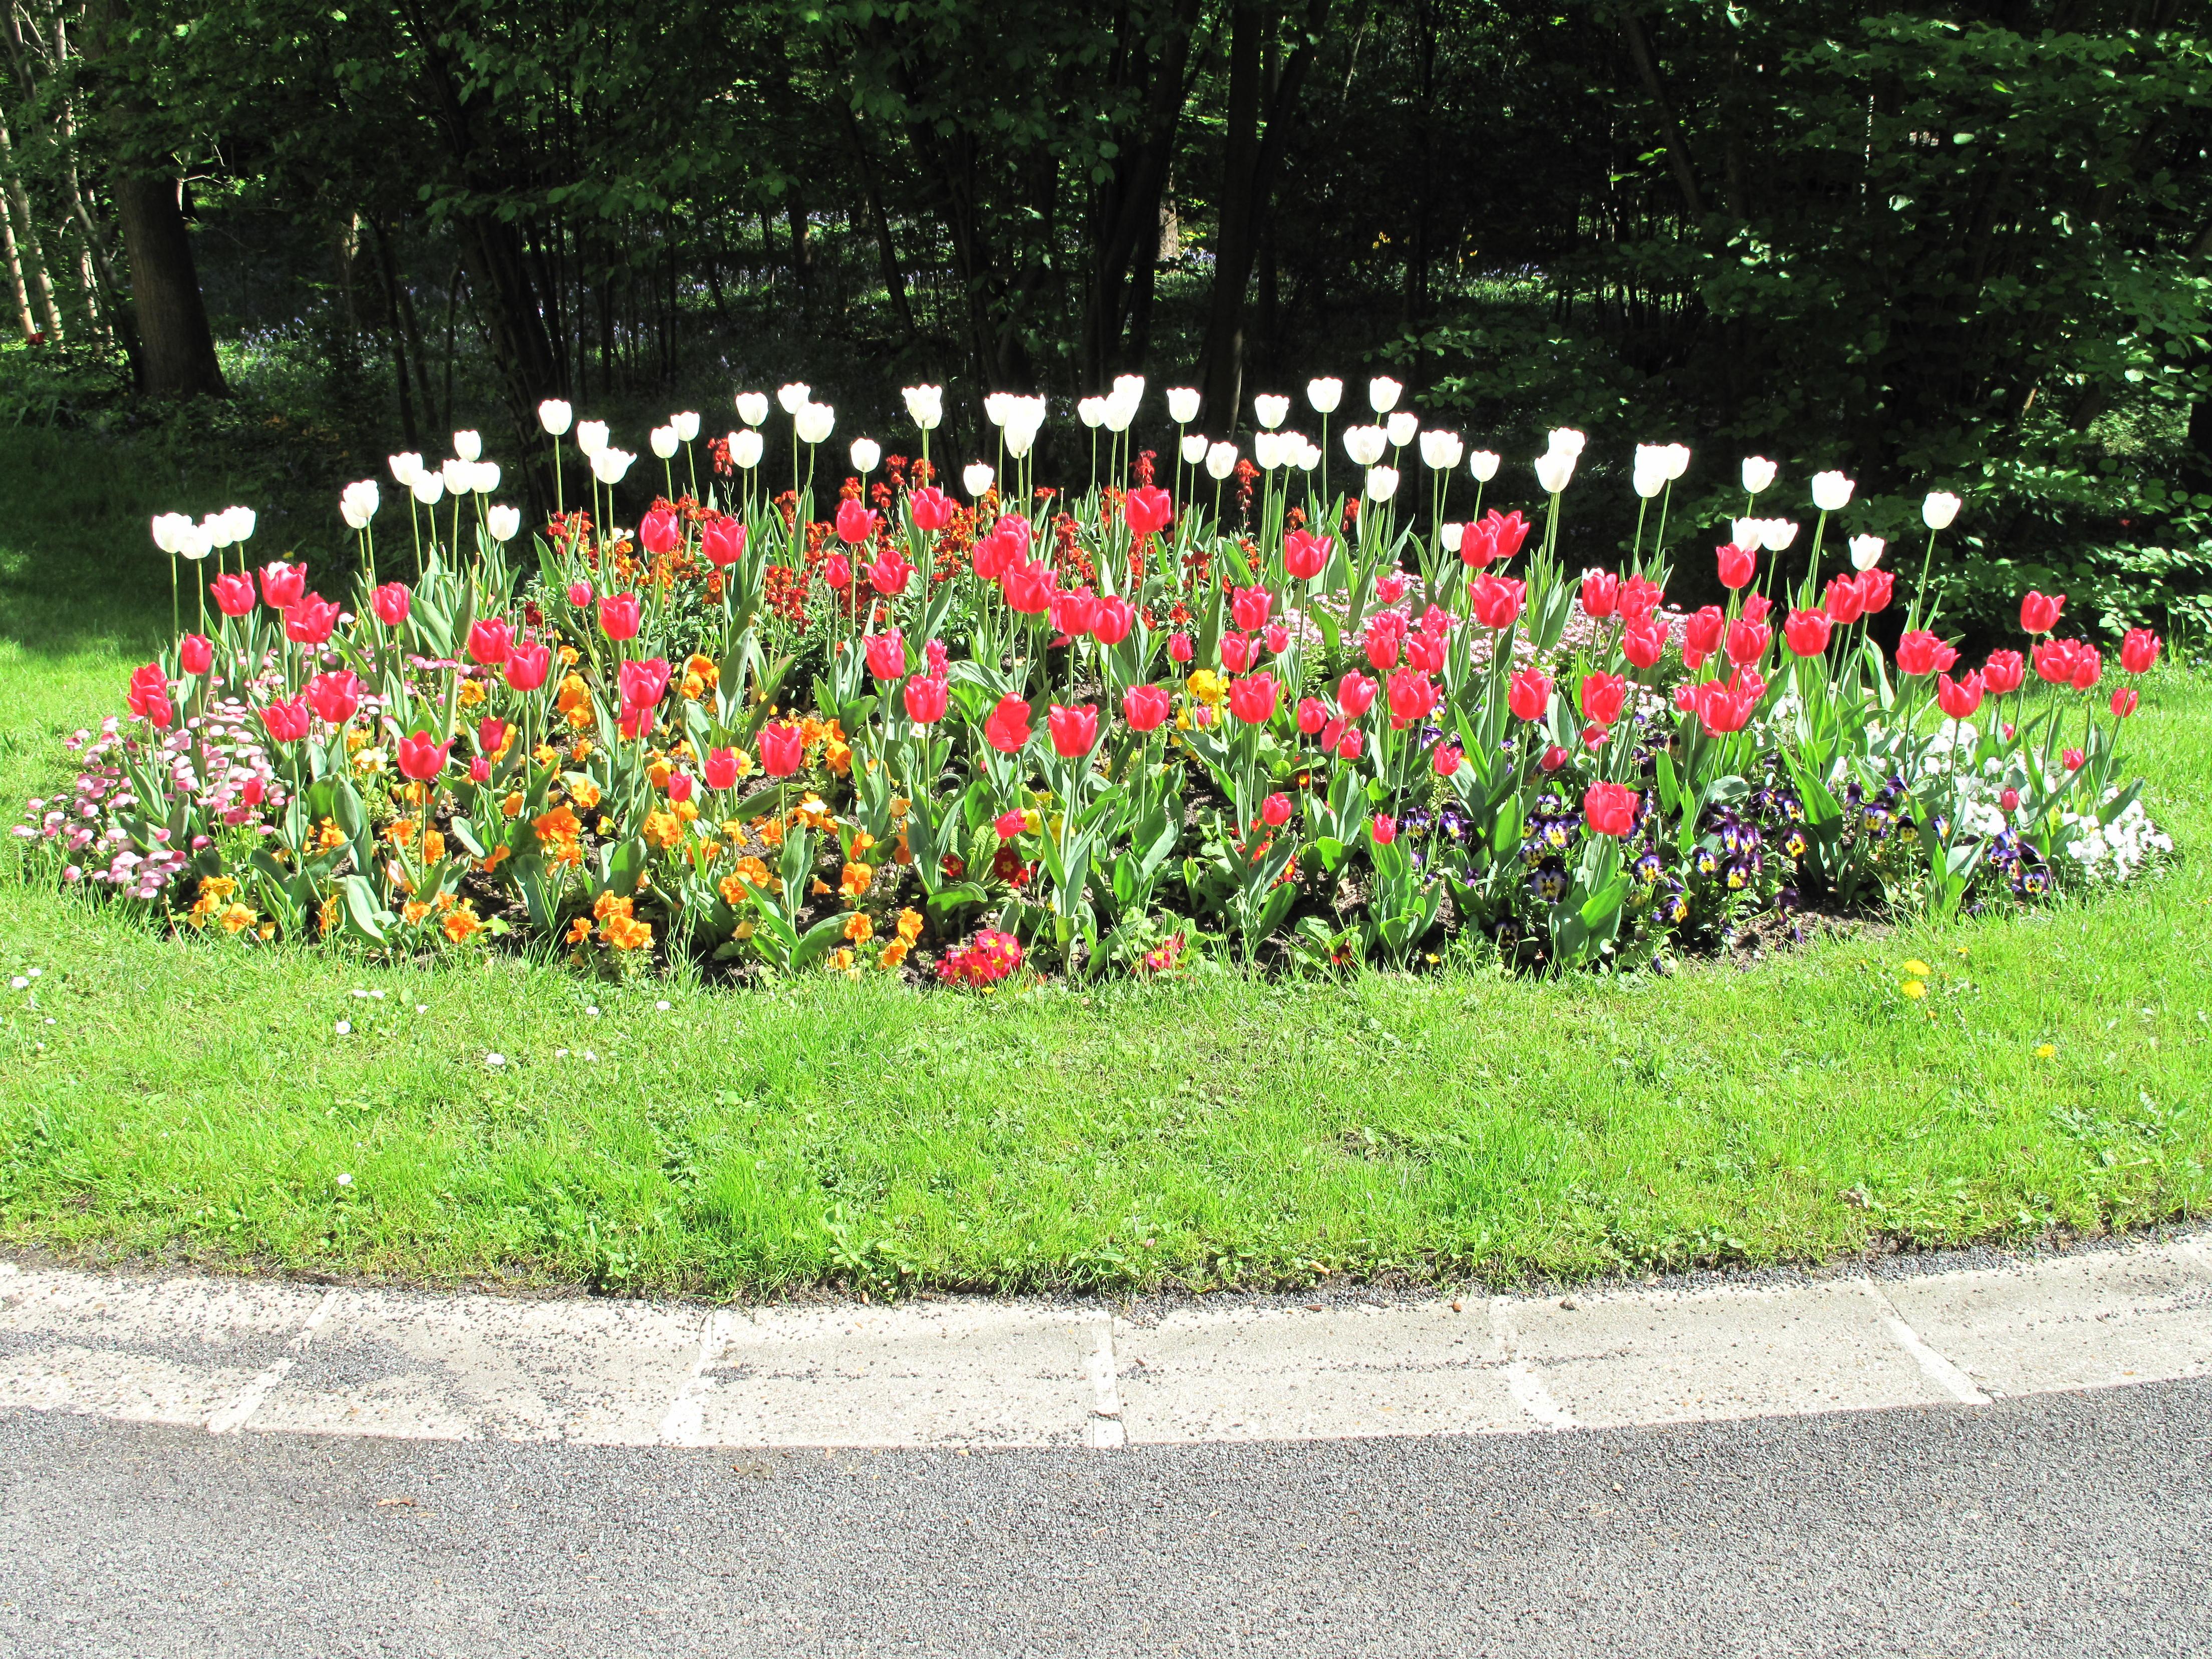 File:Flower bed (Vaires) D1305.jpg - Wikimedia Commons